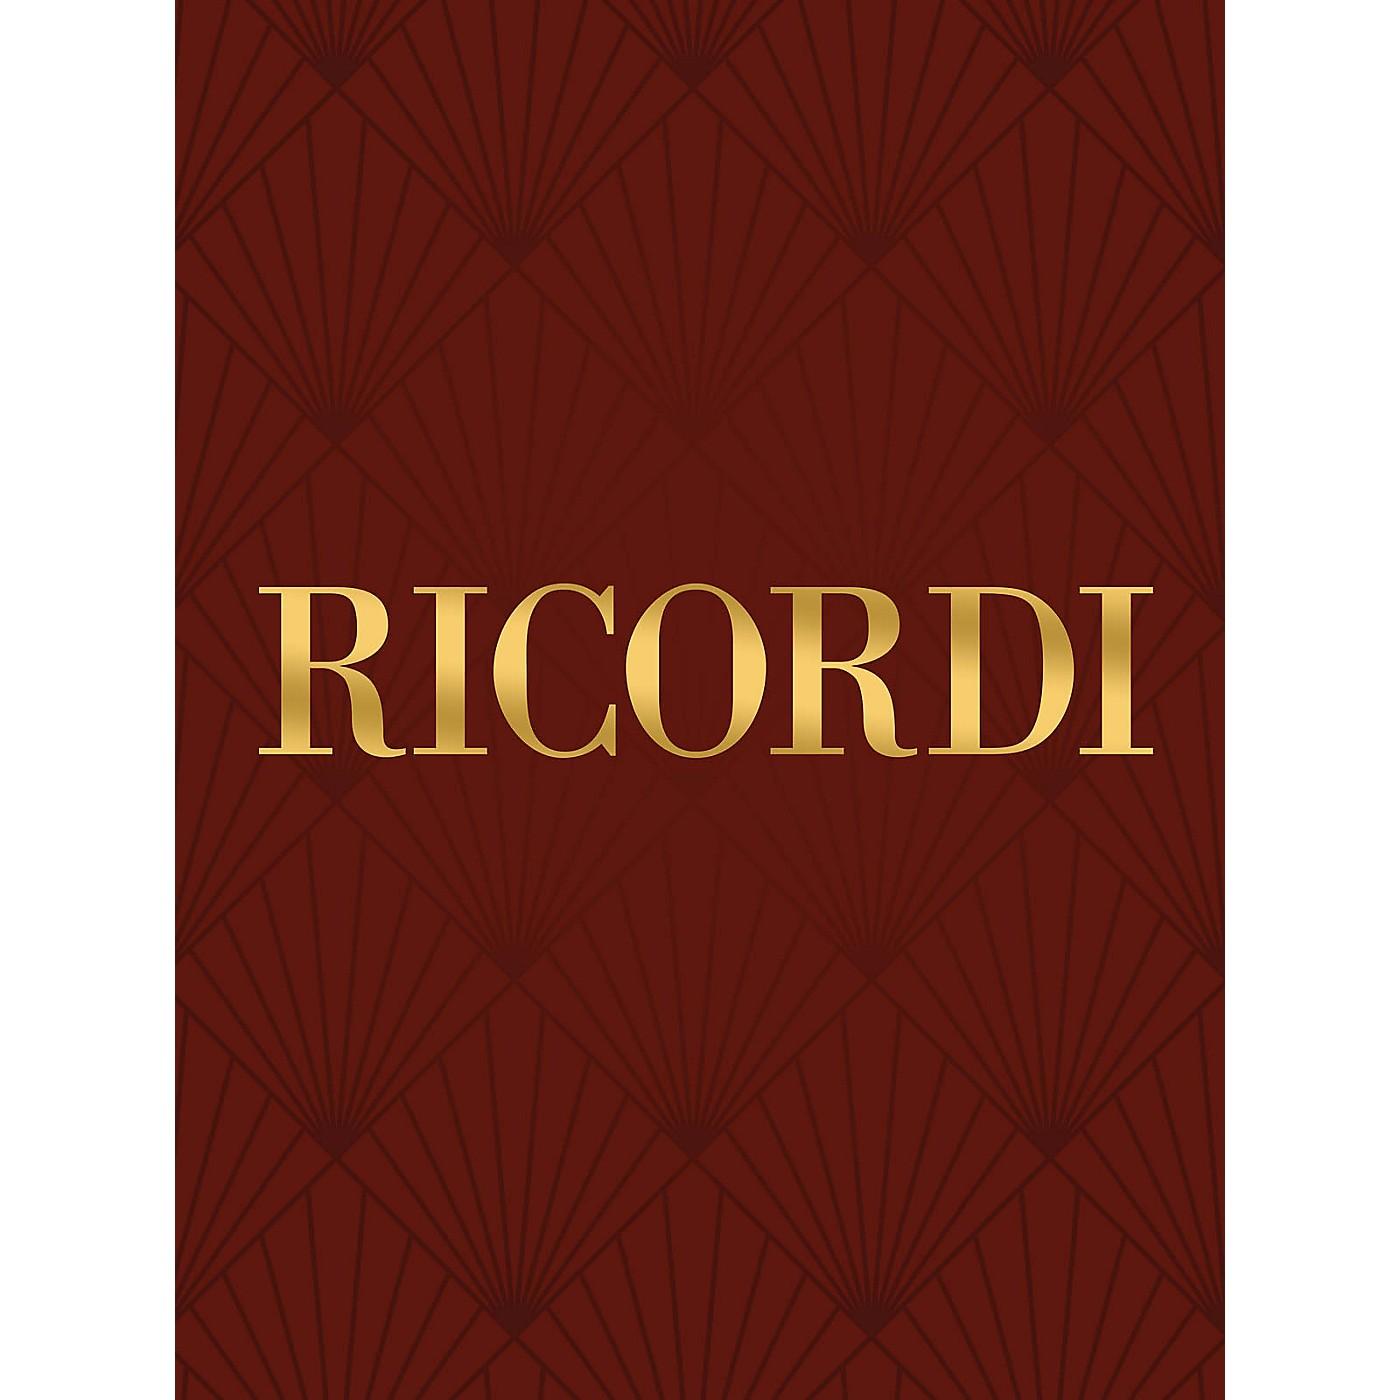 Ricordi Usignoletto bello RV796 Study Score Series Composed by Antonio Vivaldi Edited by K Heller thumbnail